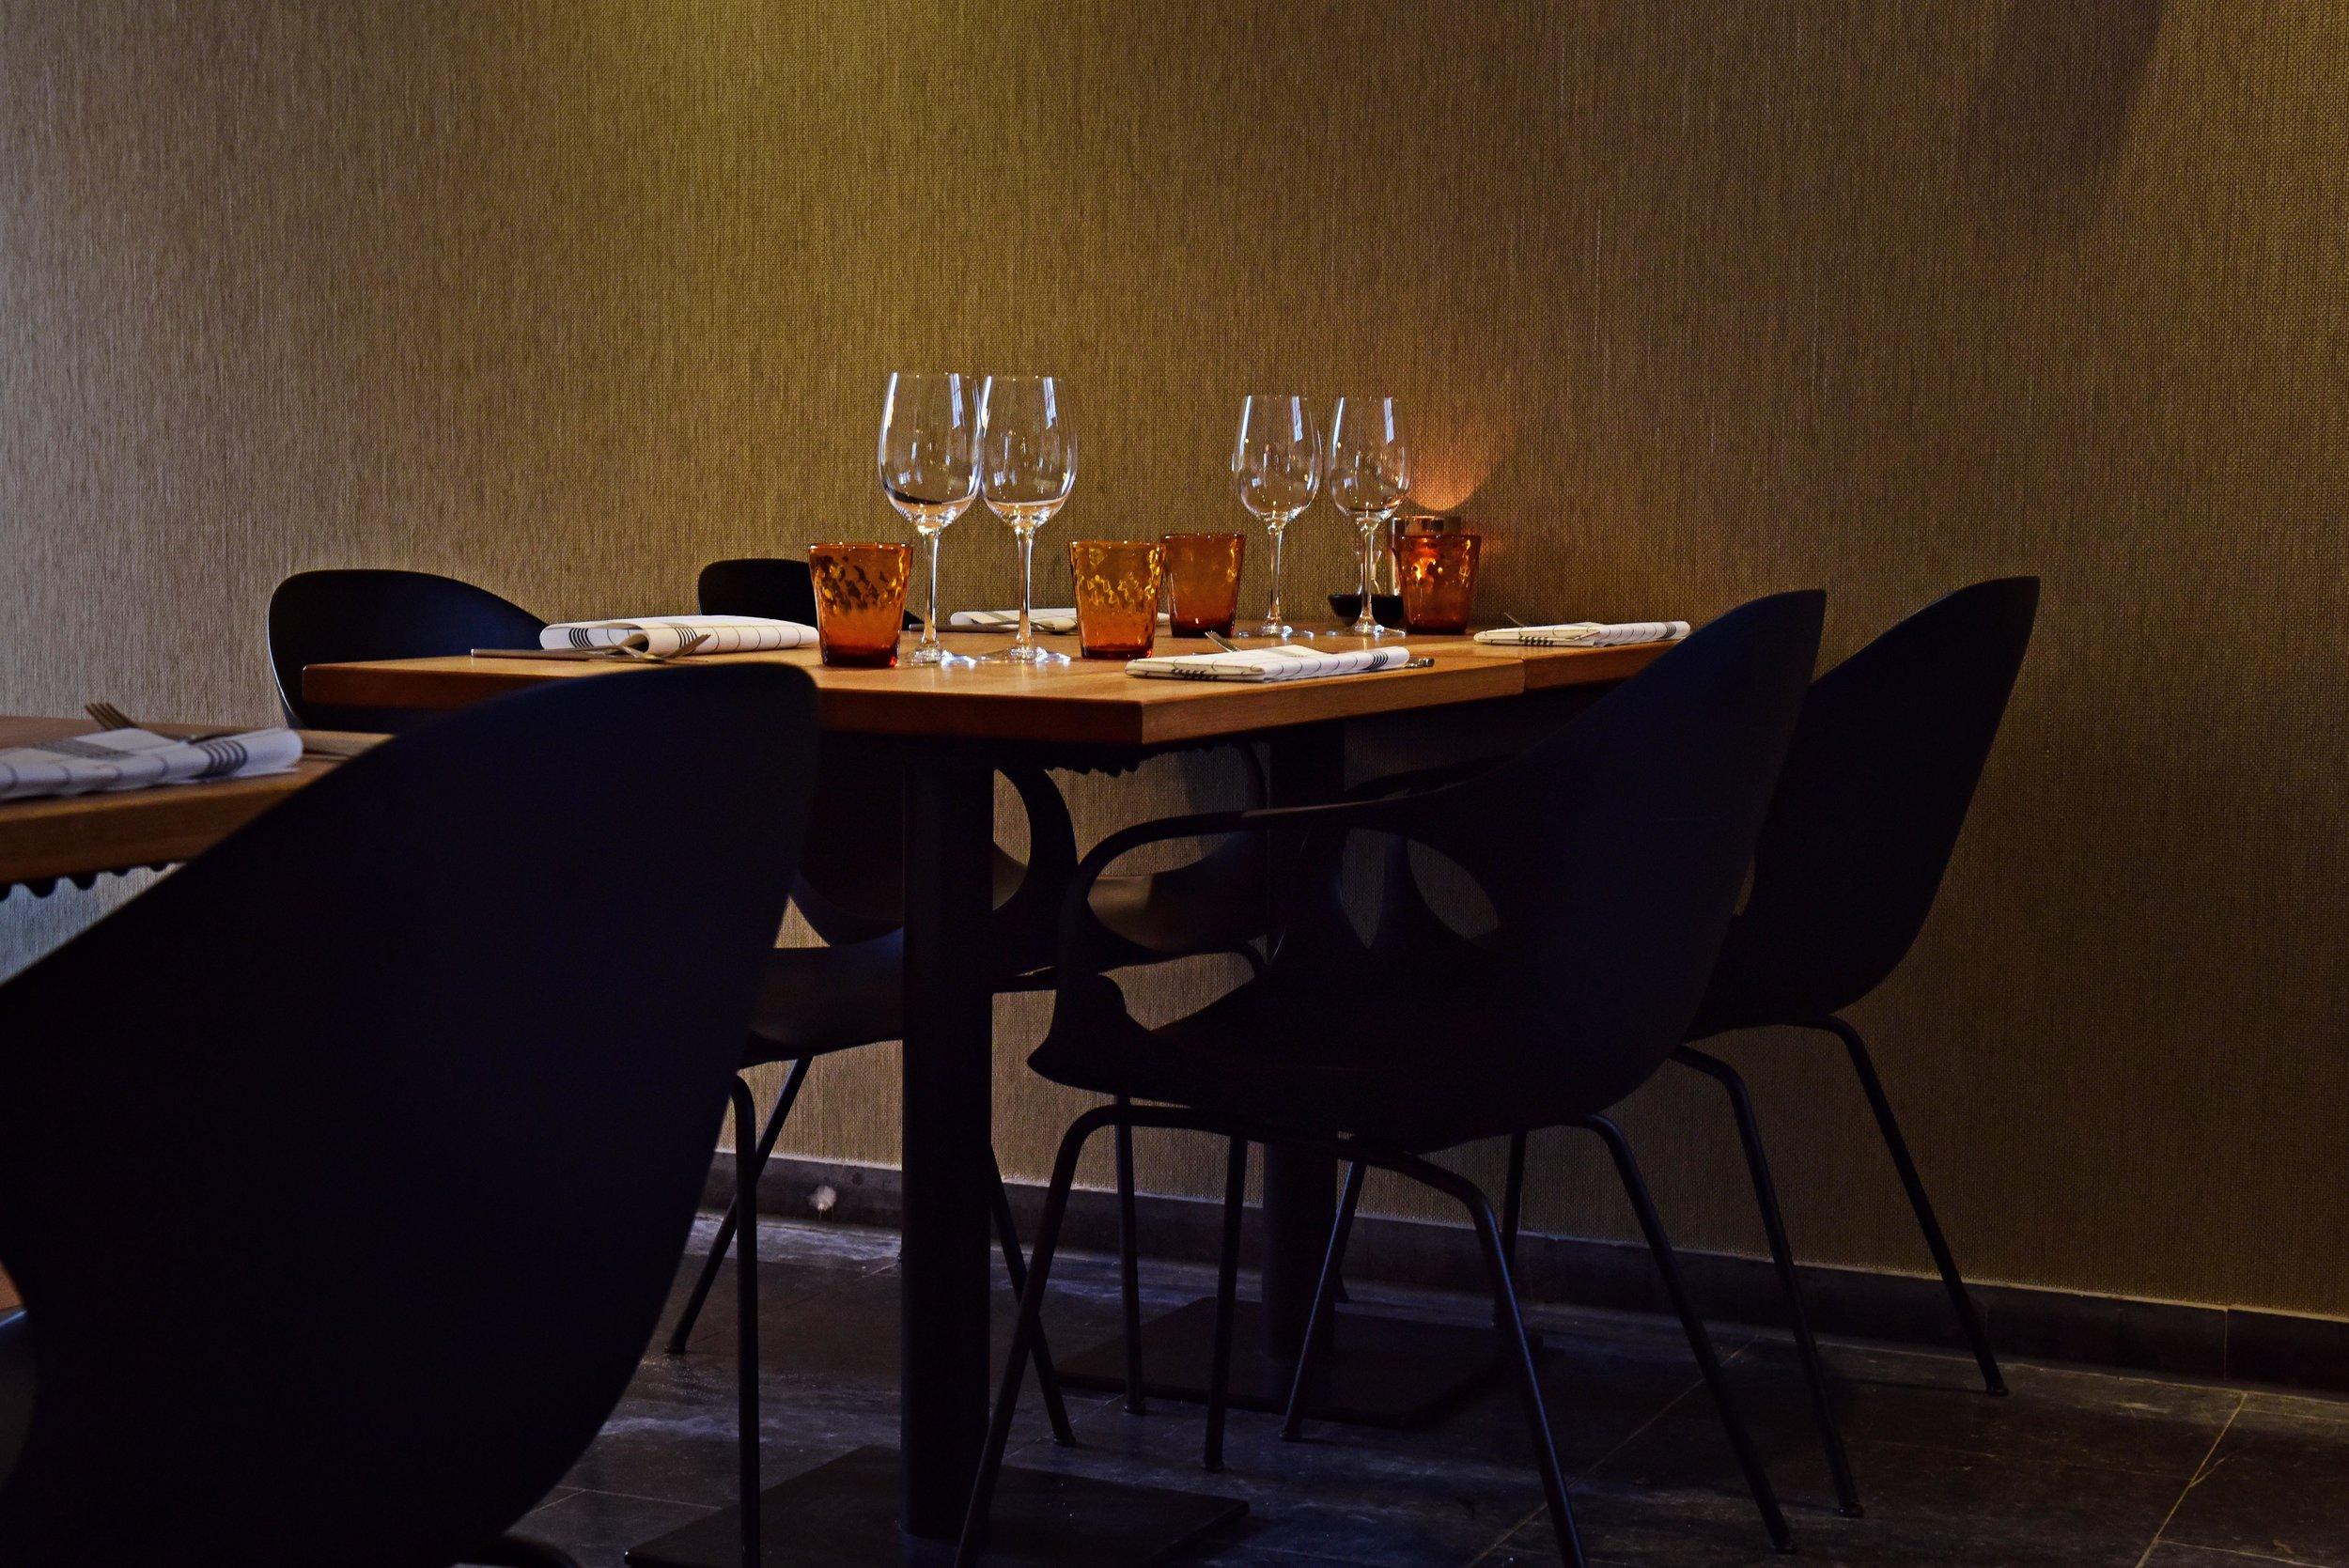 1 brasserie just restaurant tablefever bart albrecht culinair fotograaf foodfotograaf.jpg